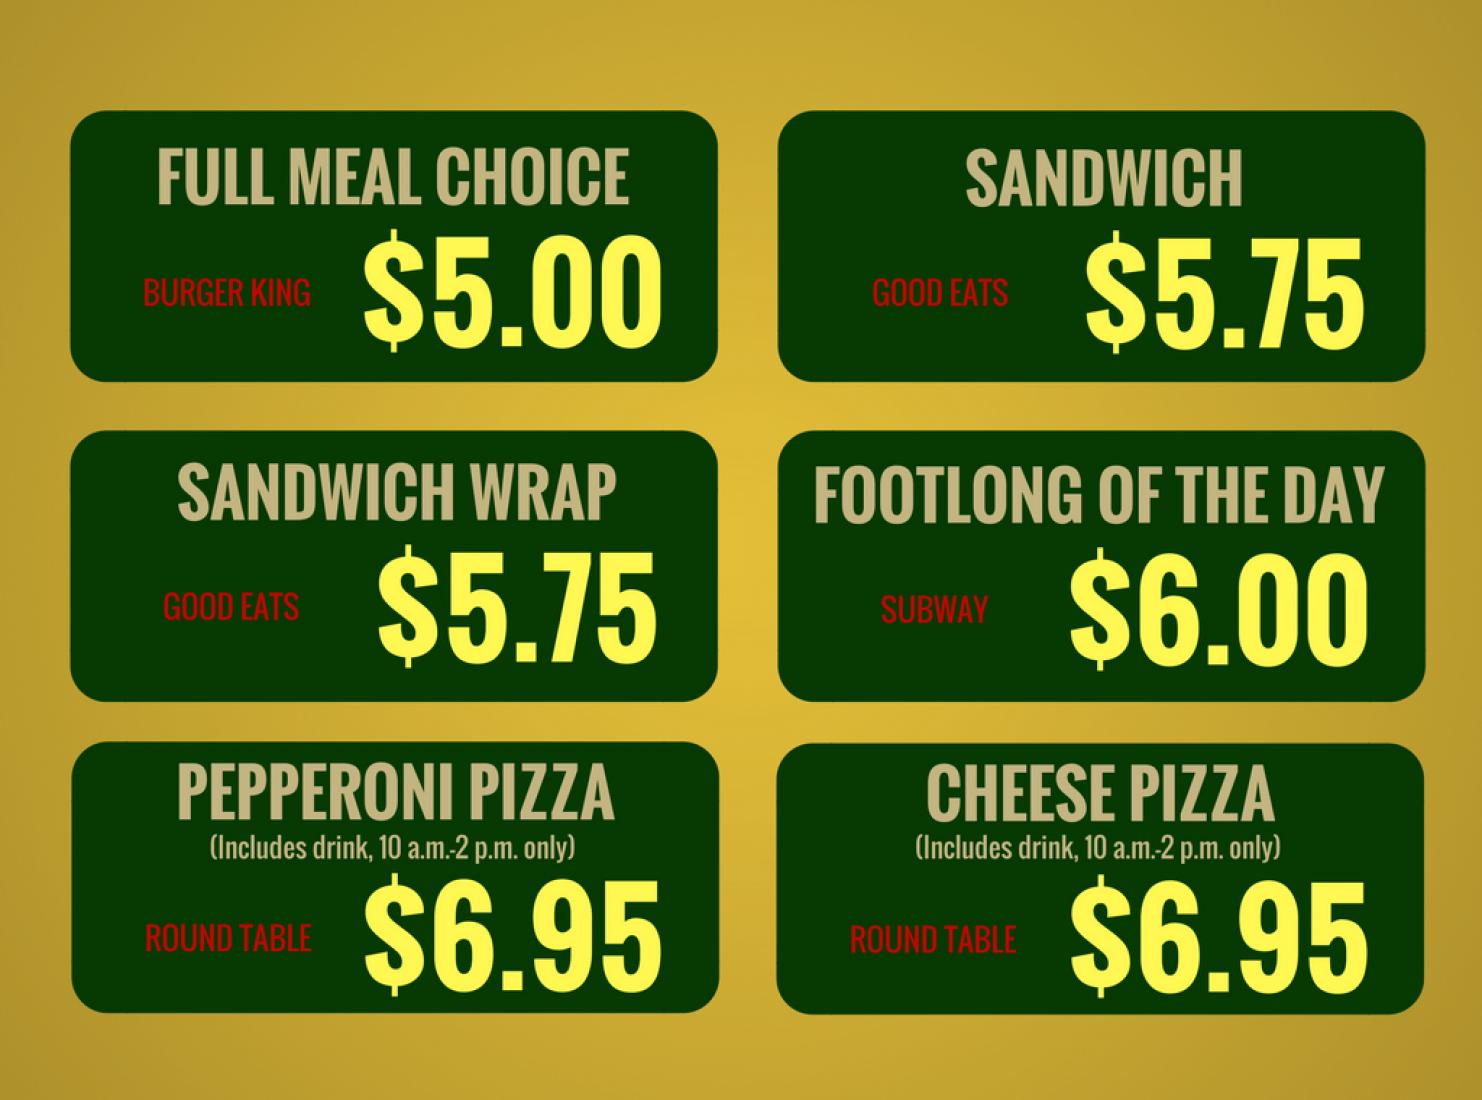 Sales Tax On Fast Food In California